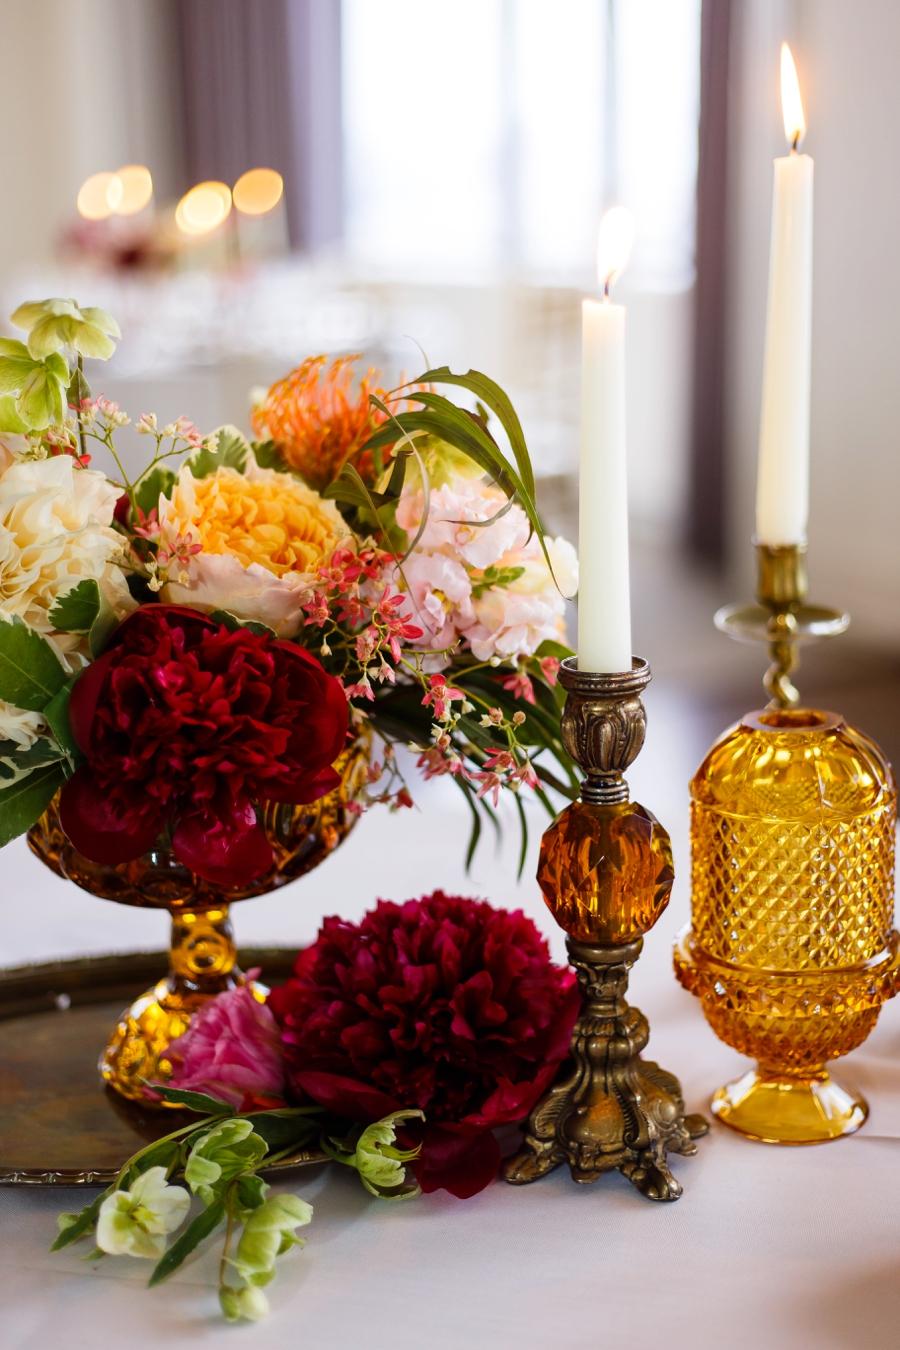 Elegant Berry Inspired Wedding Ideas Every Last Detail